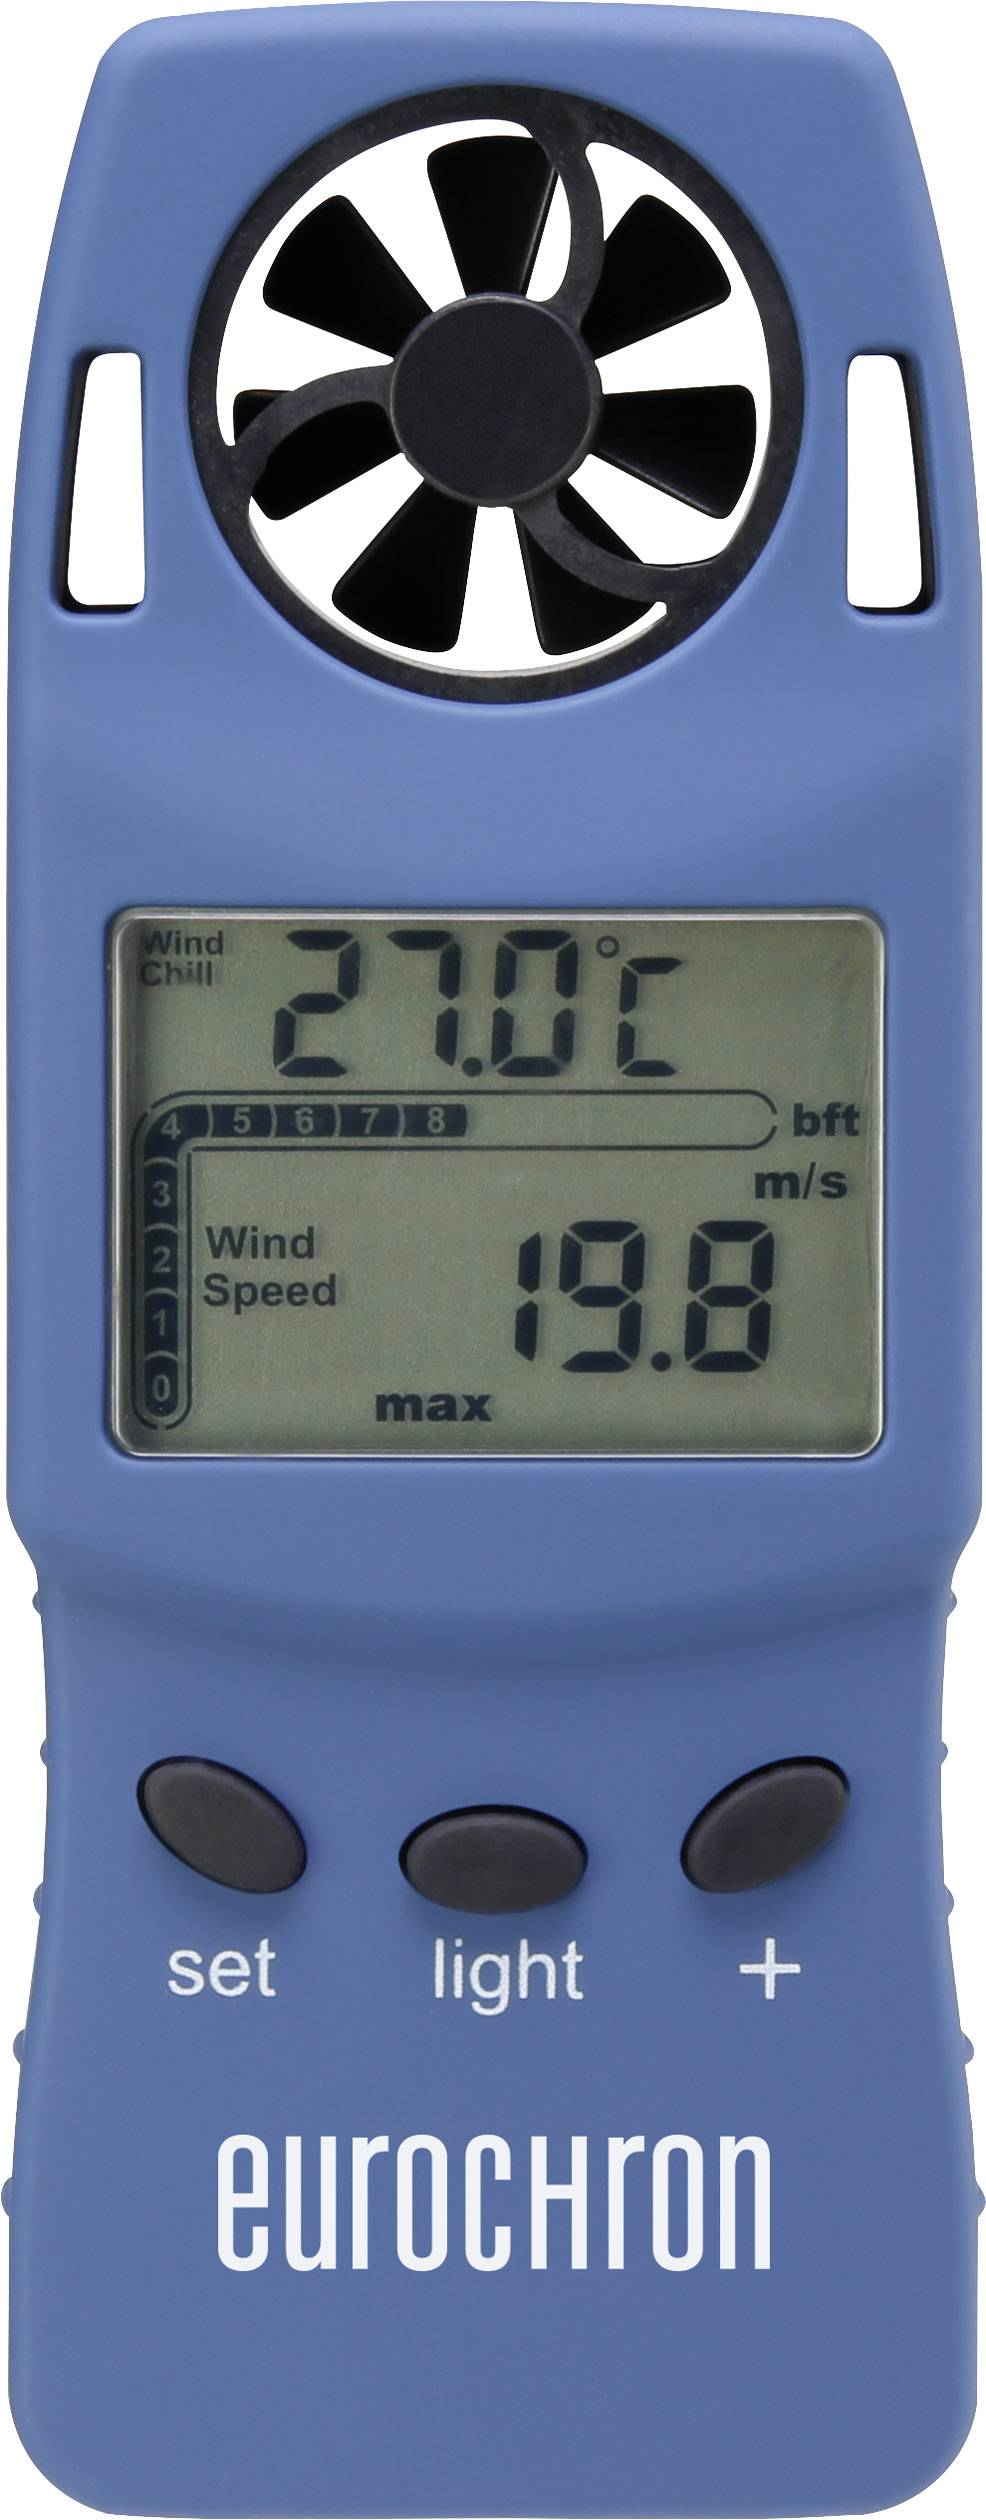 Anemometr Eurochron WS4003 0.3 až 30 m/s